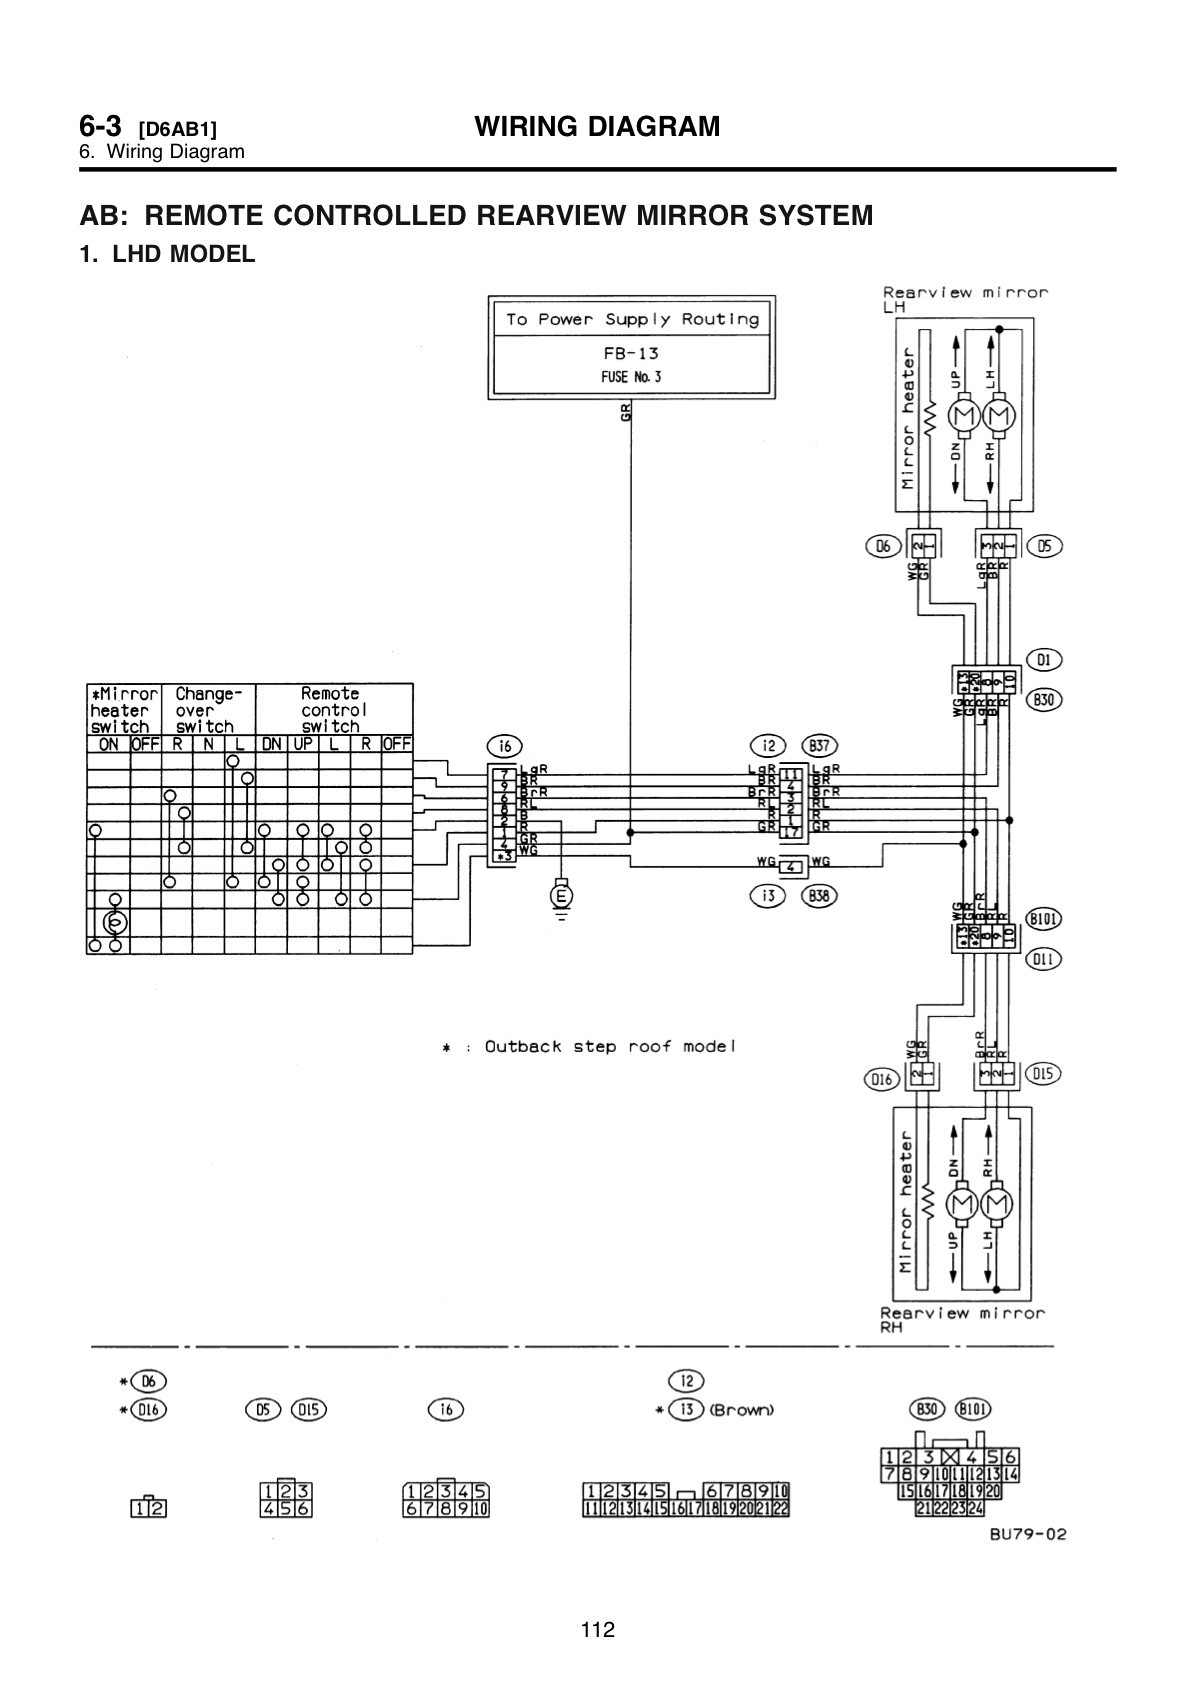 Gntx 313 10 Pin Wiring Diagram Gentex 313 10 Pin Wiring Diagram Gentex 5 Pin Wiring Diagram